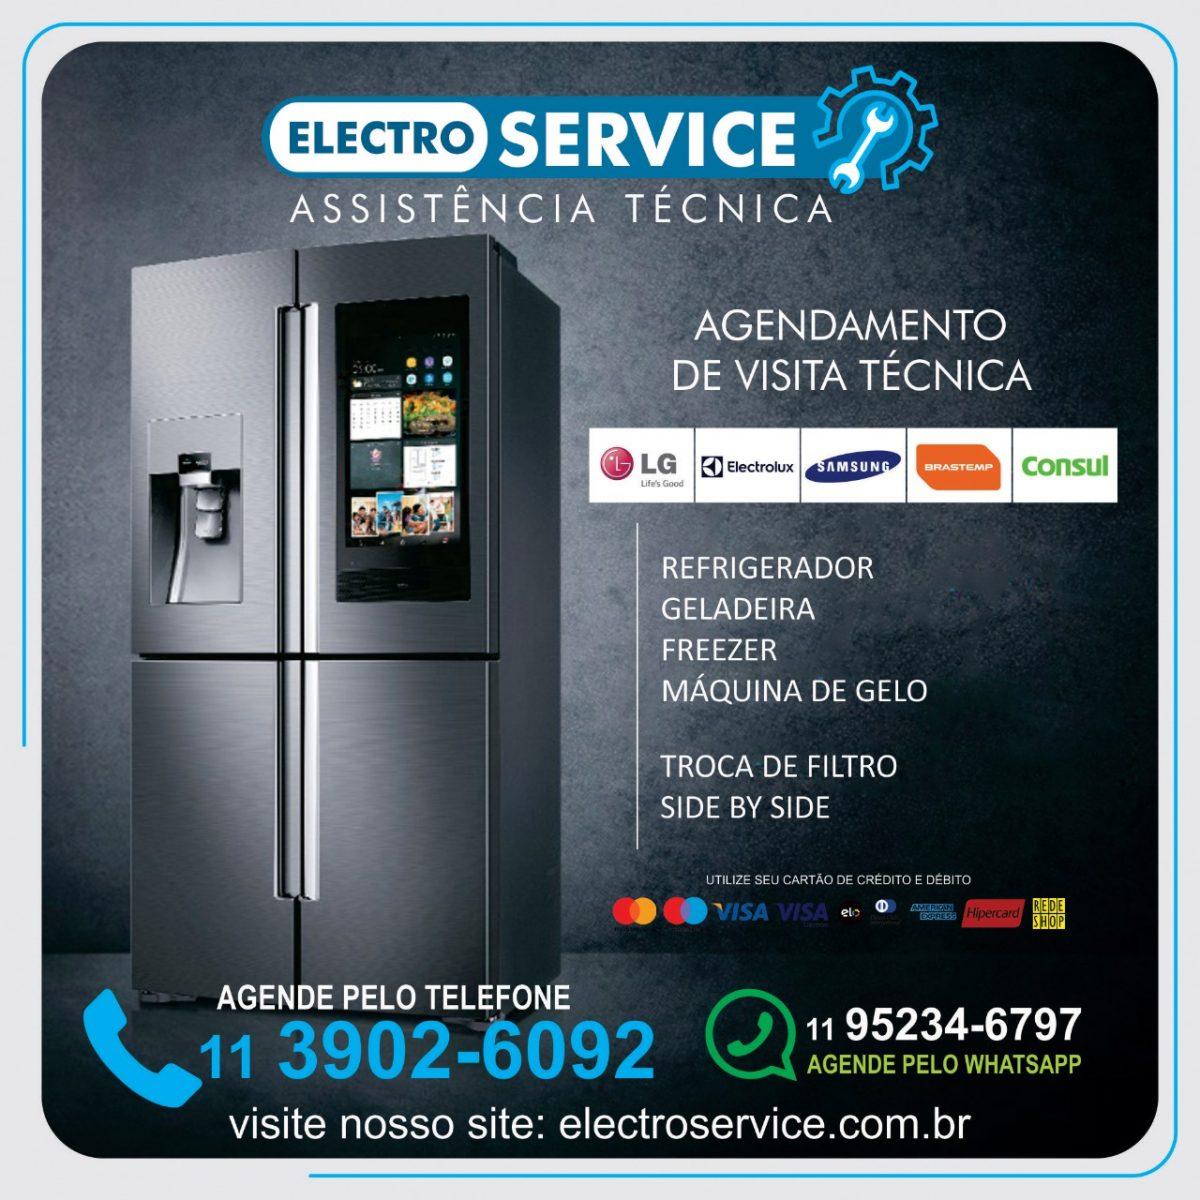 electroservice.com.br